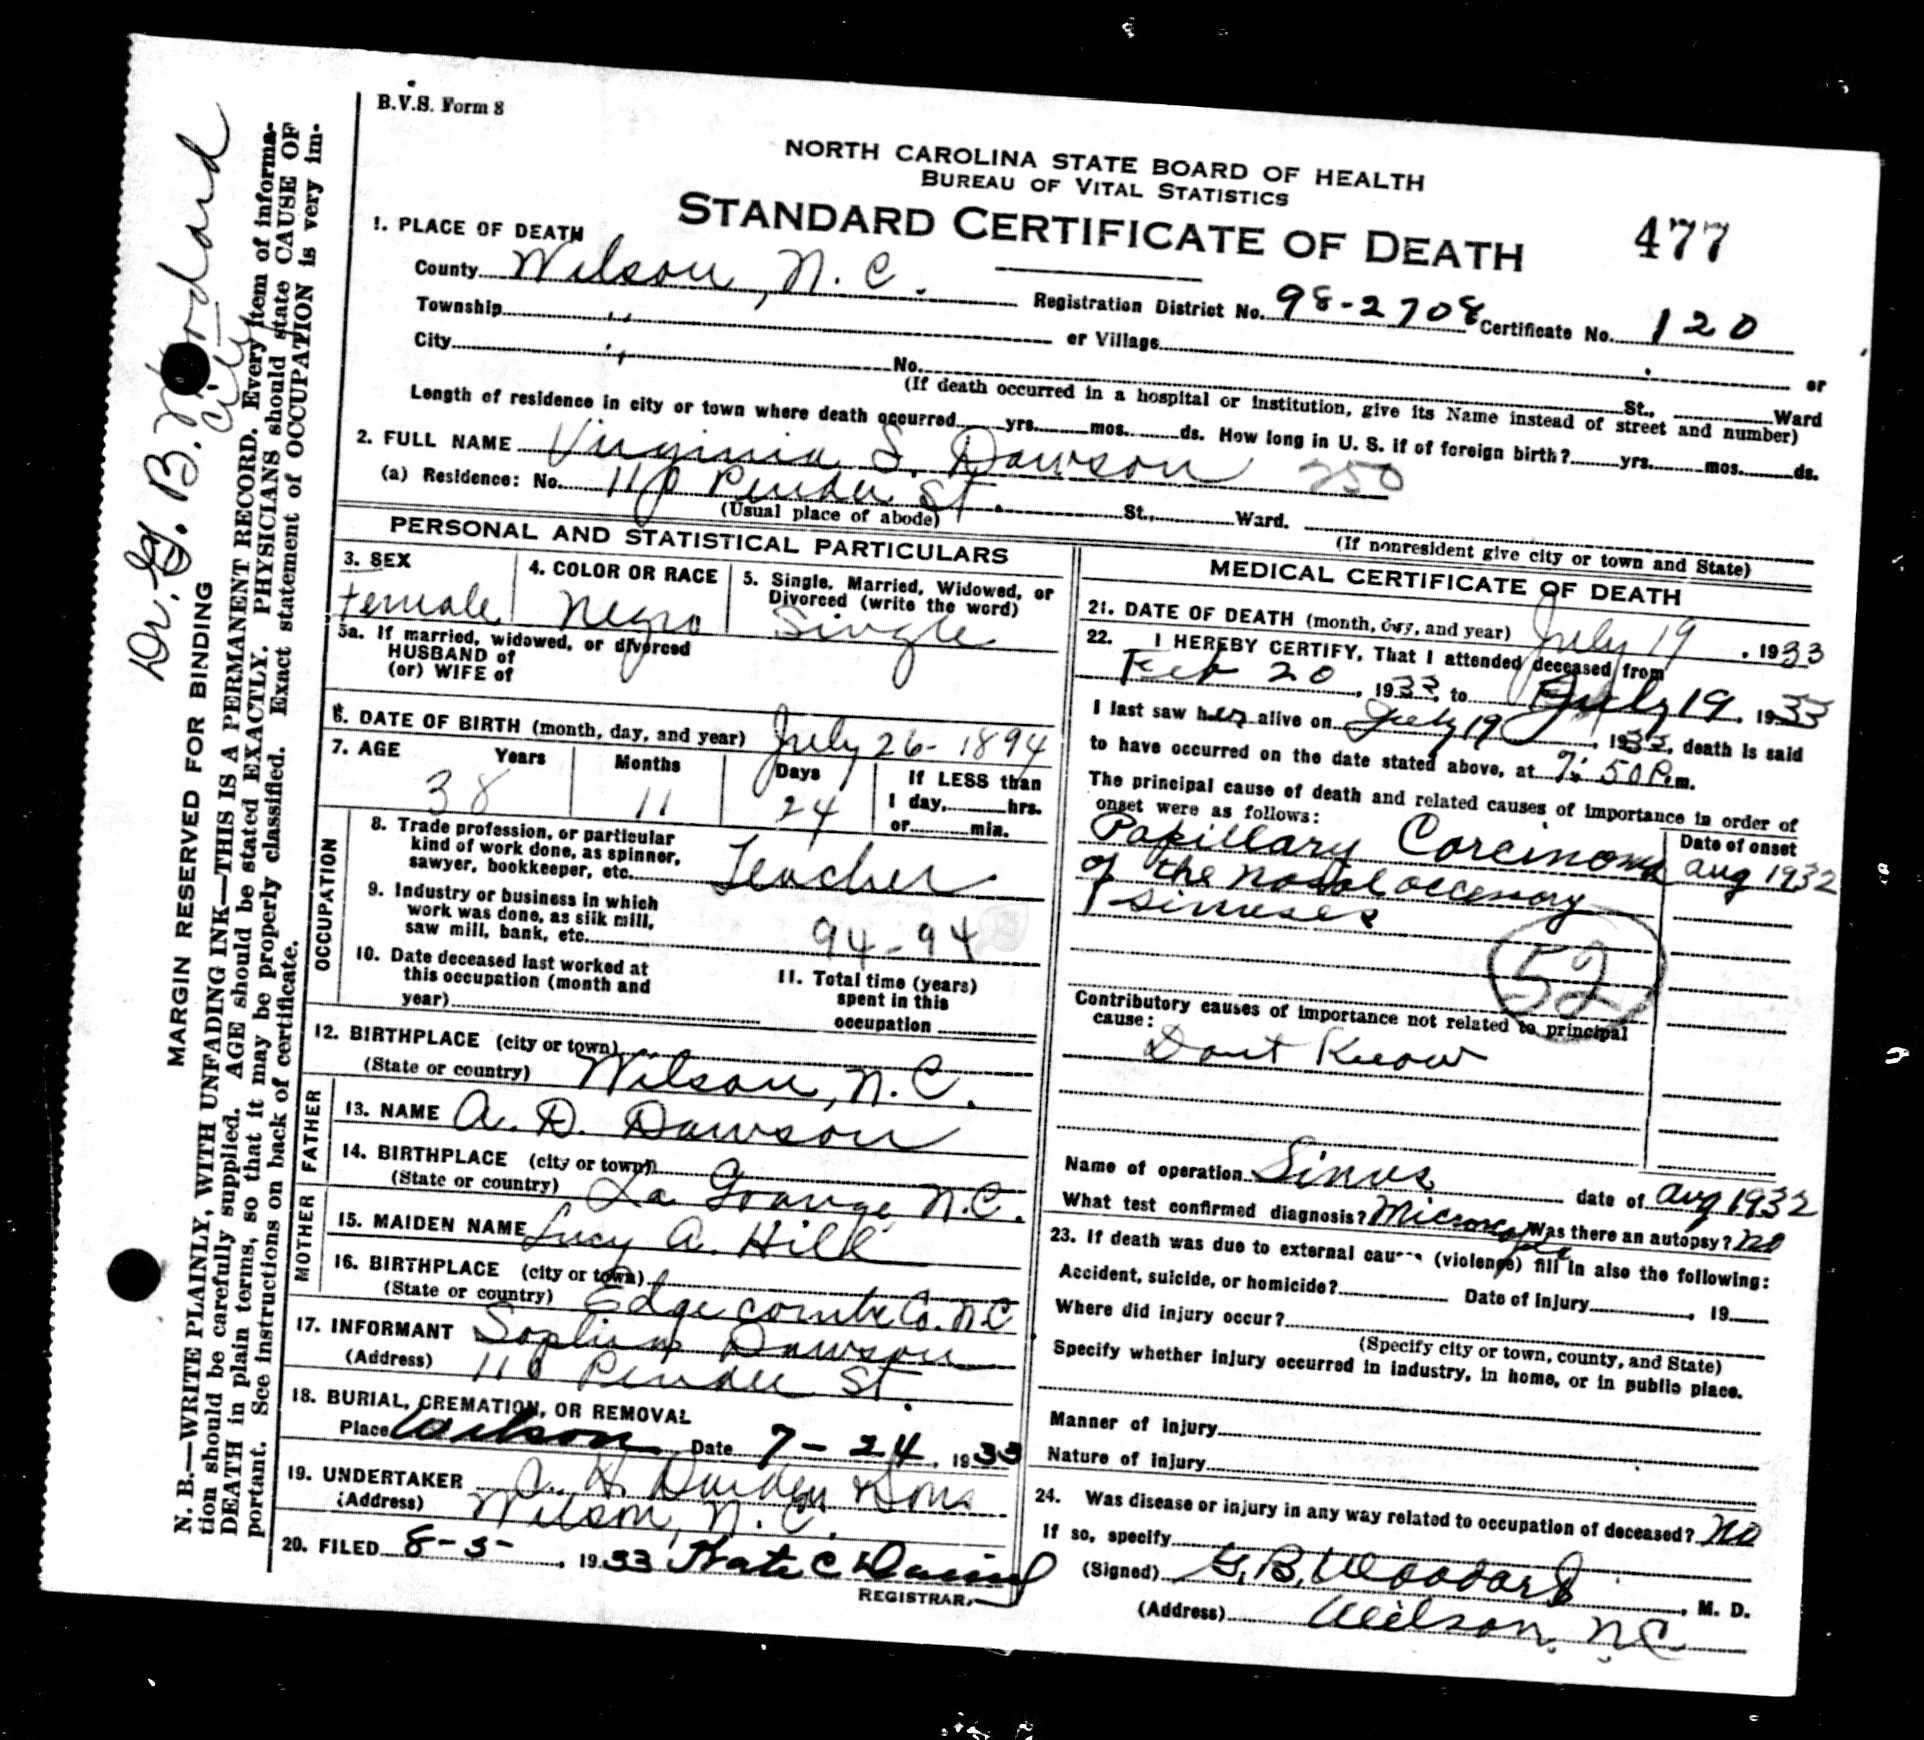 Death certificate black wide awake edith omega carter spicer xflitez Gallery